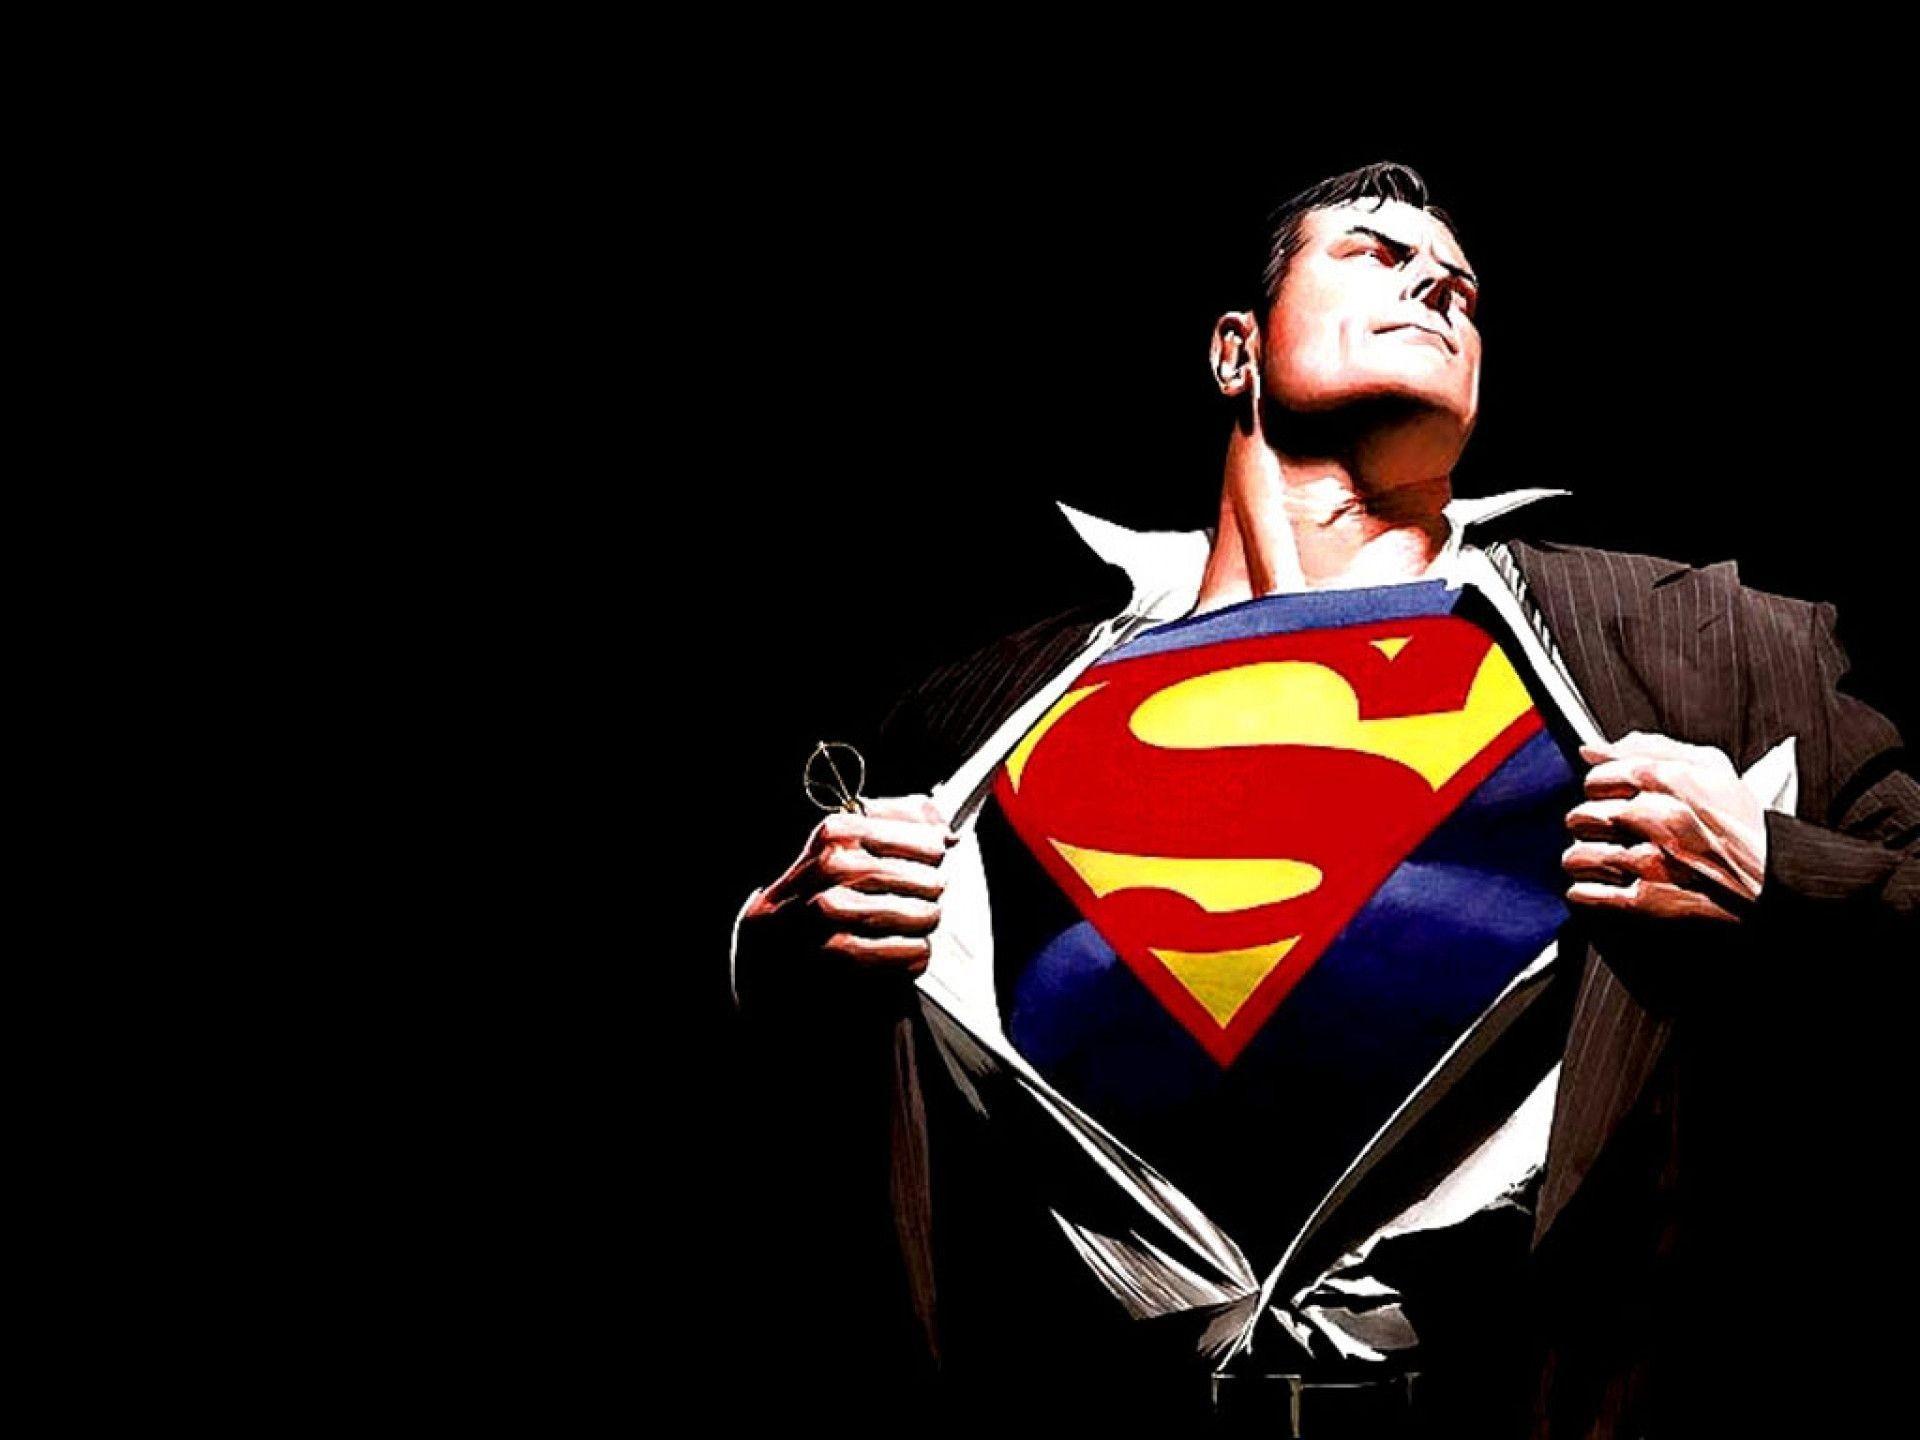 Superman Screensavers and Wallpaper 71 images 1920x1440